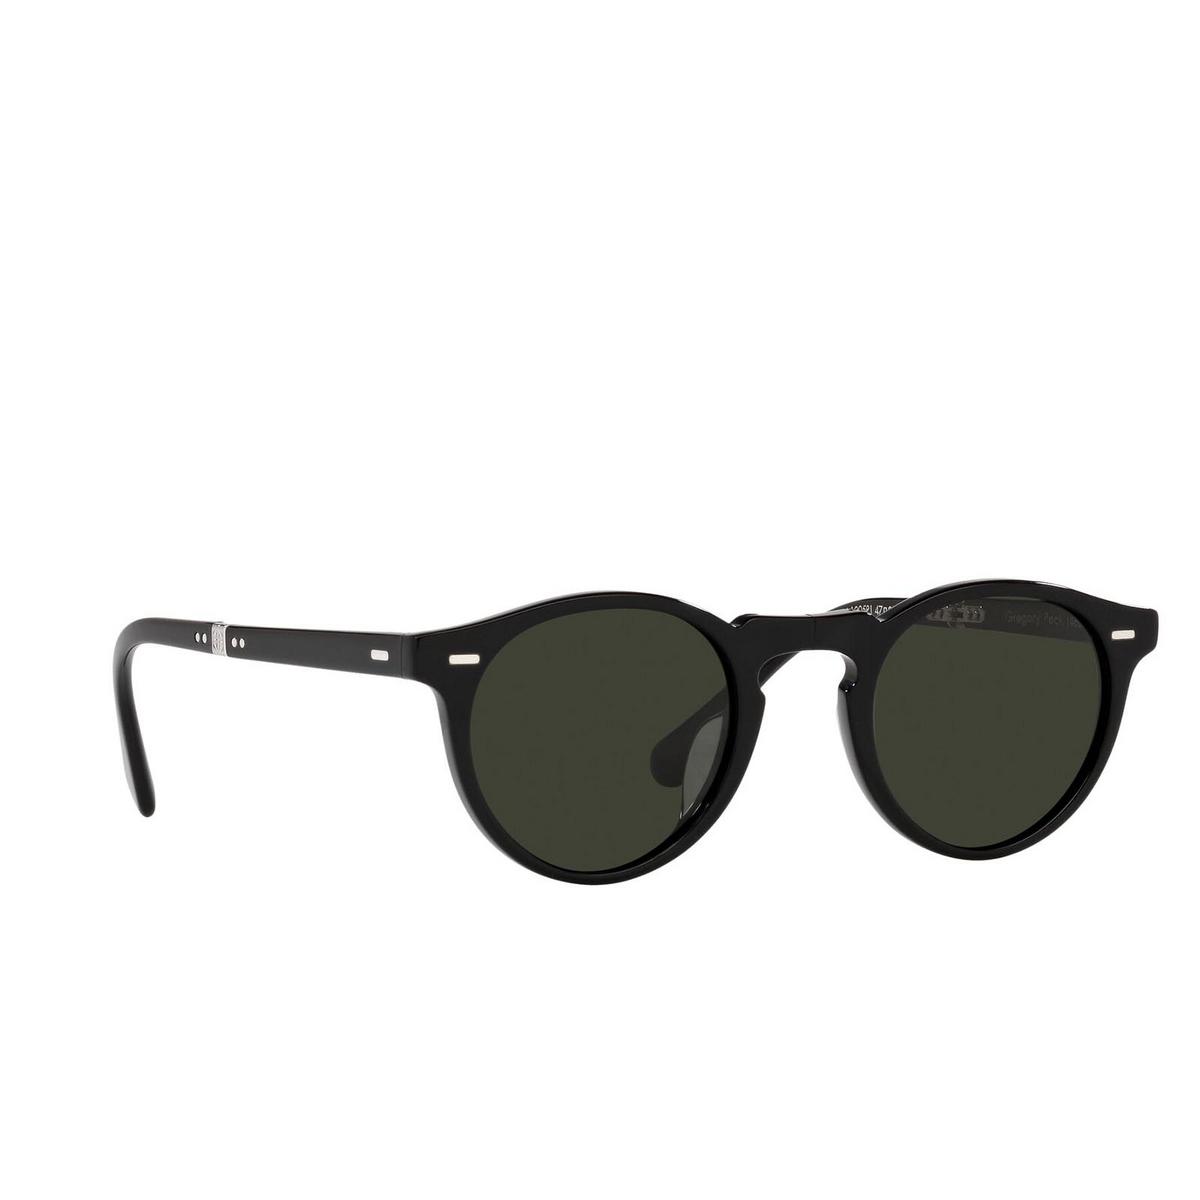 Oliver Peoples® Round Sunglasses: Gregory Peck 1962 OV5456SU color Black 1005P1.